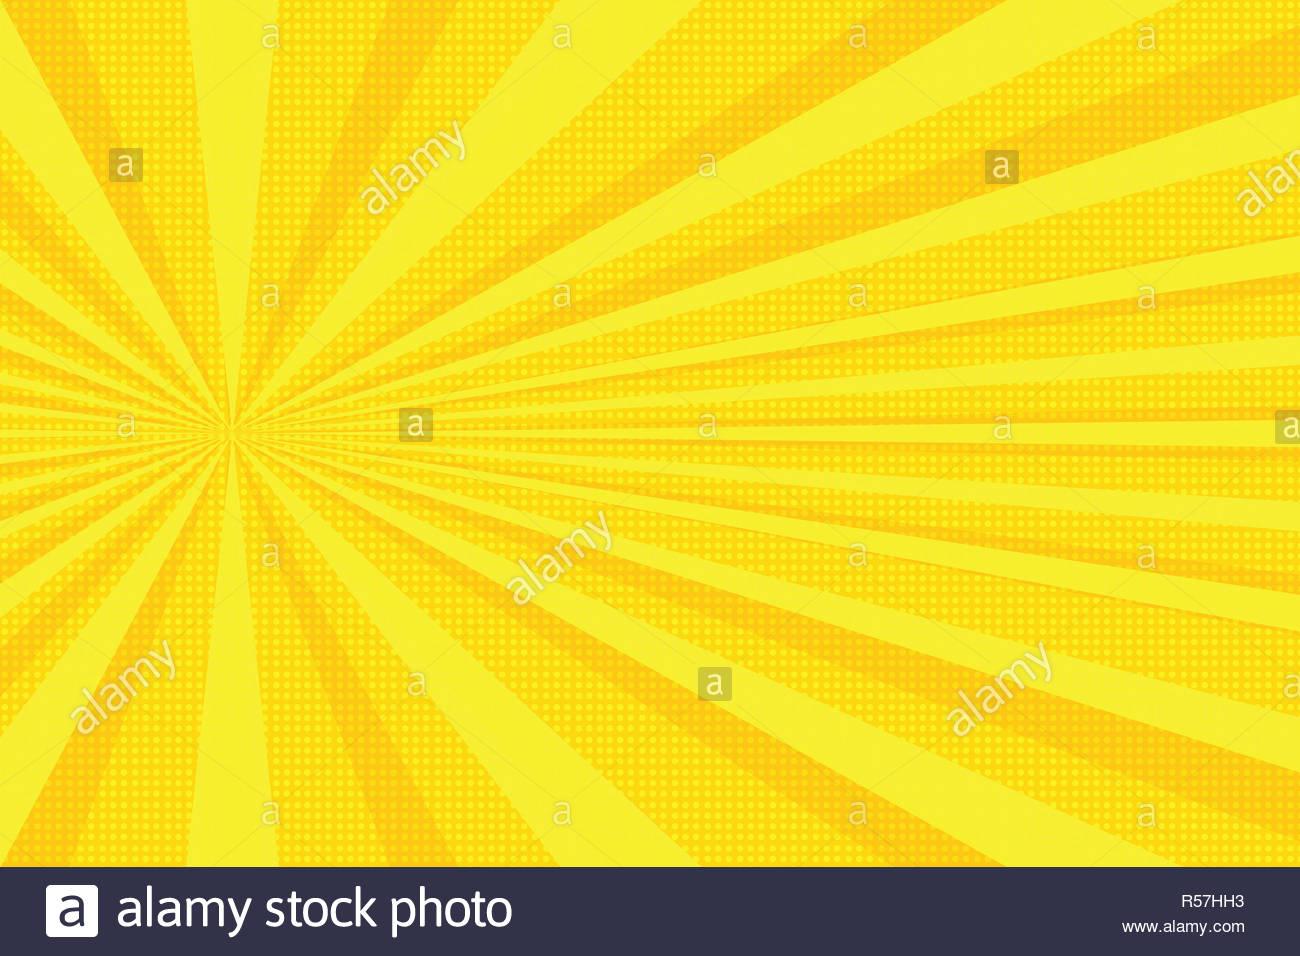 yellow rays pop art background - Stock Image